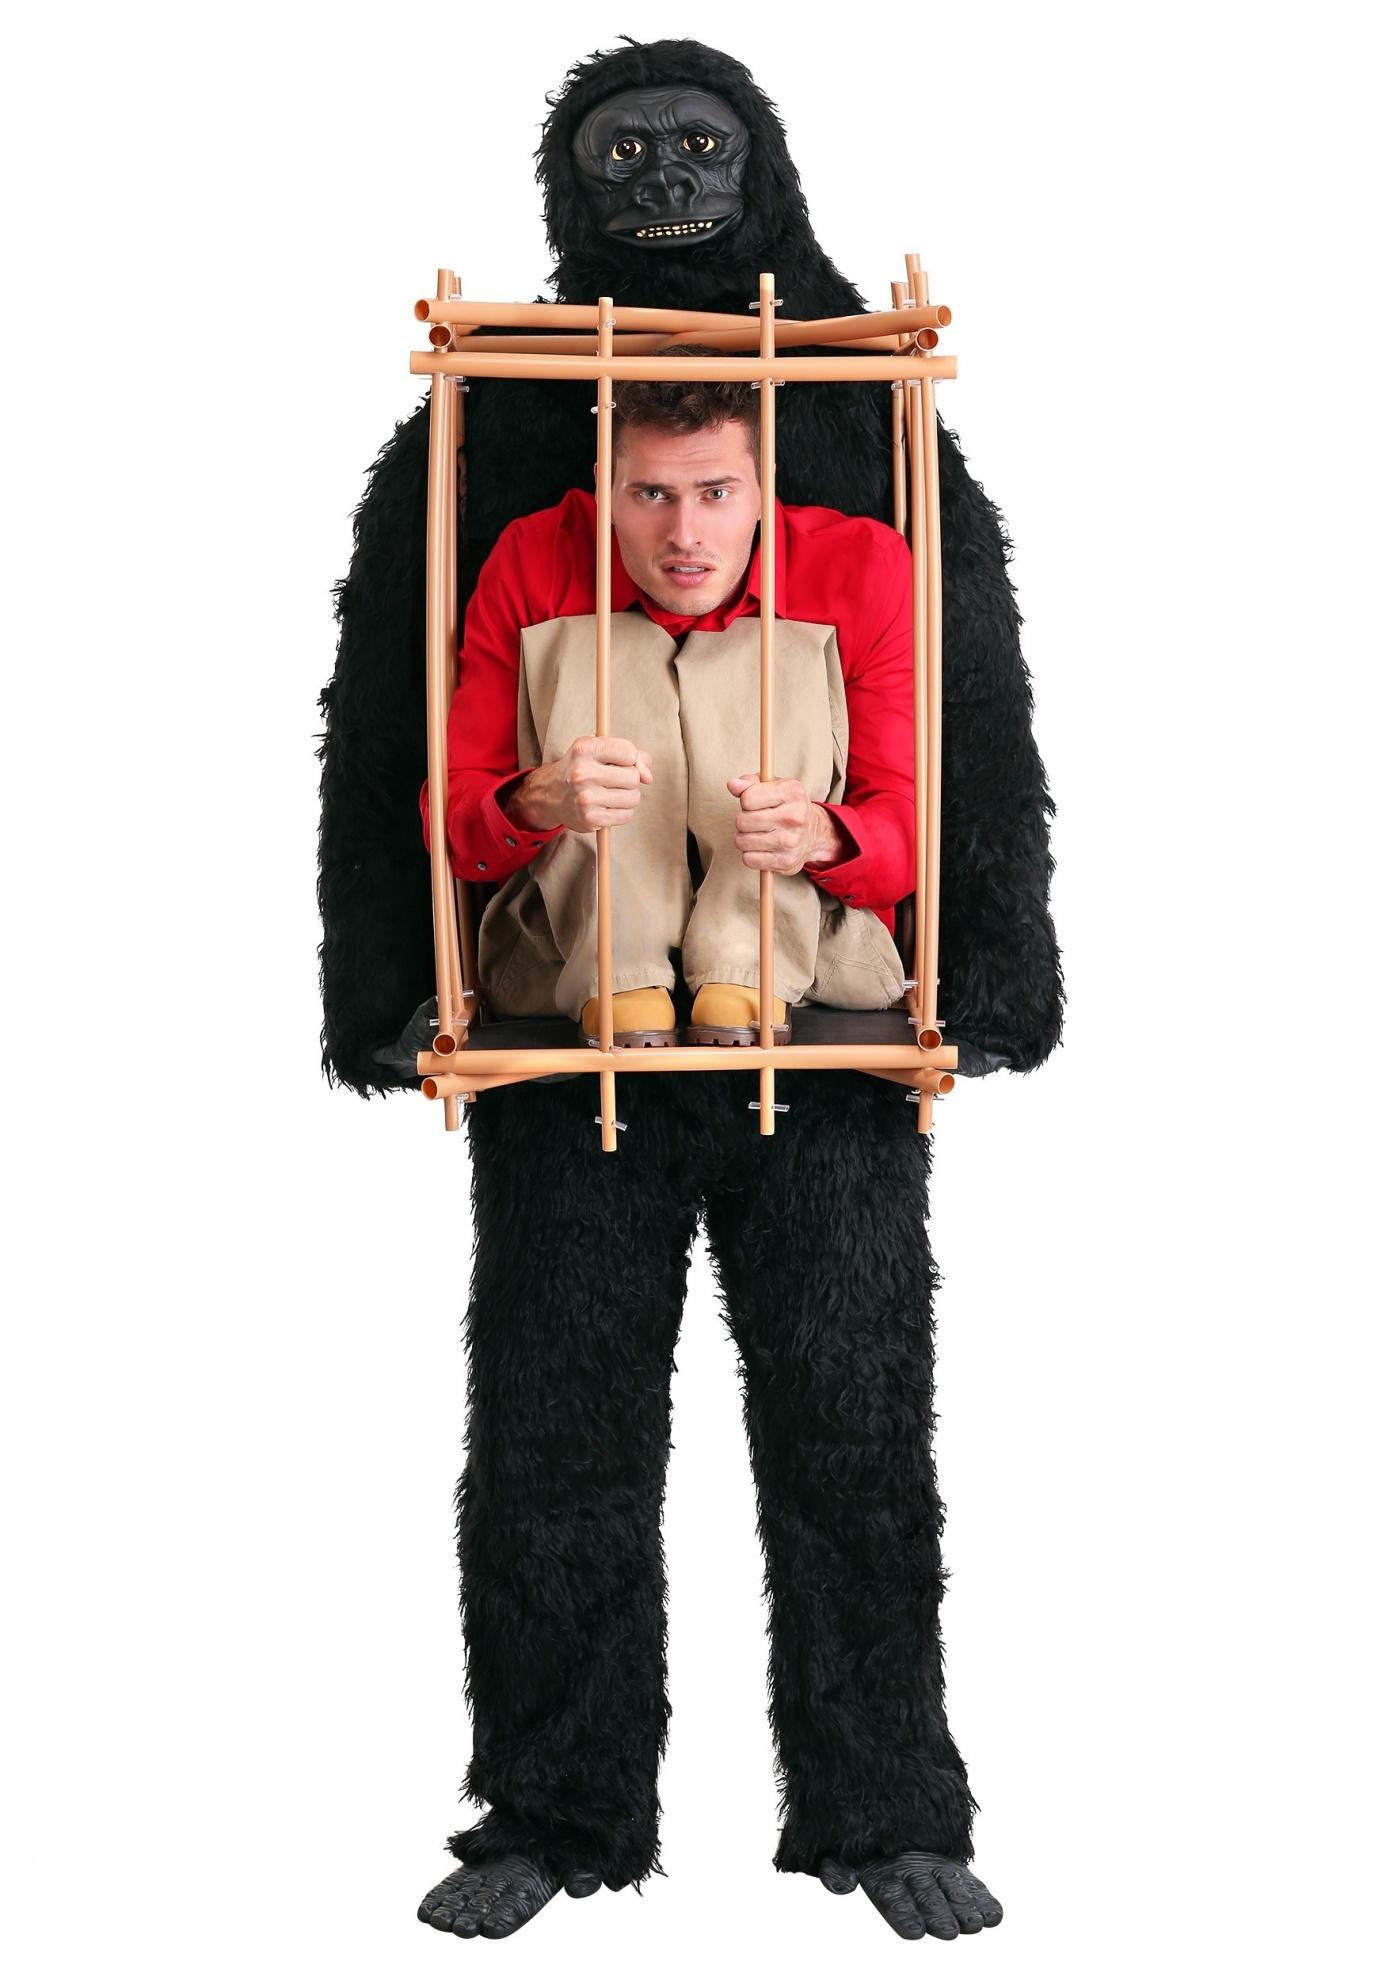 Gorilla Cage Halloween Costume